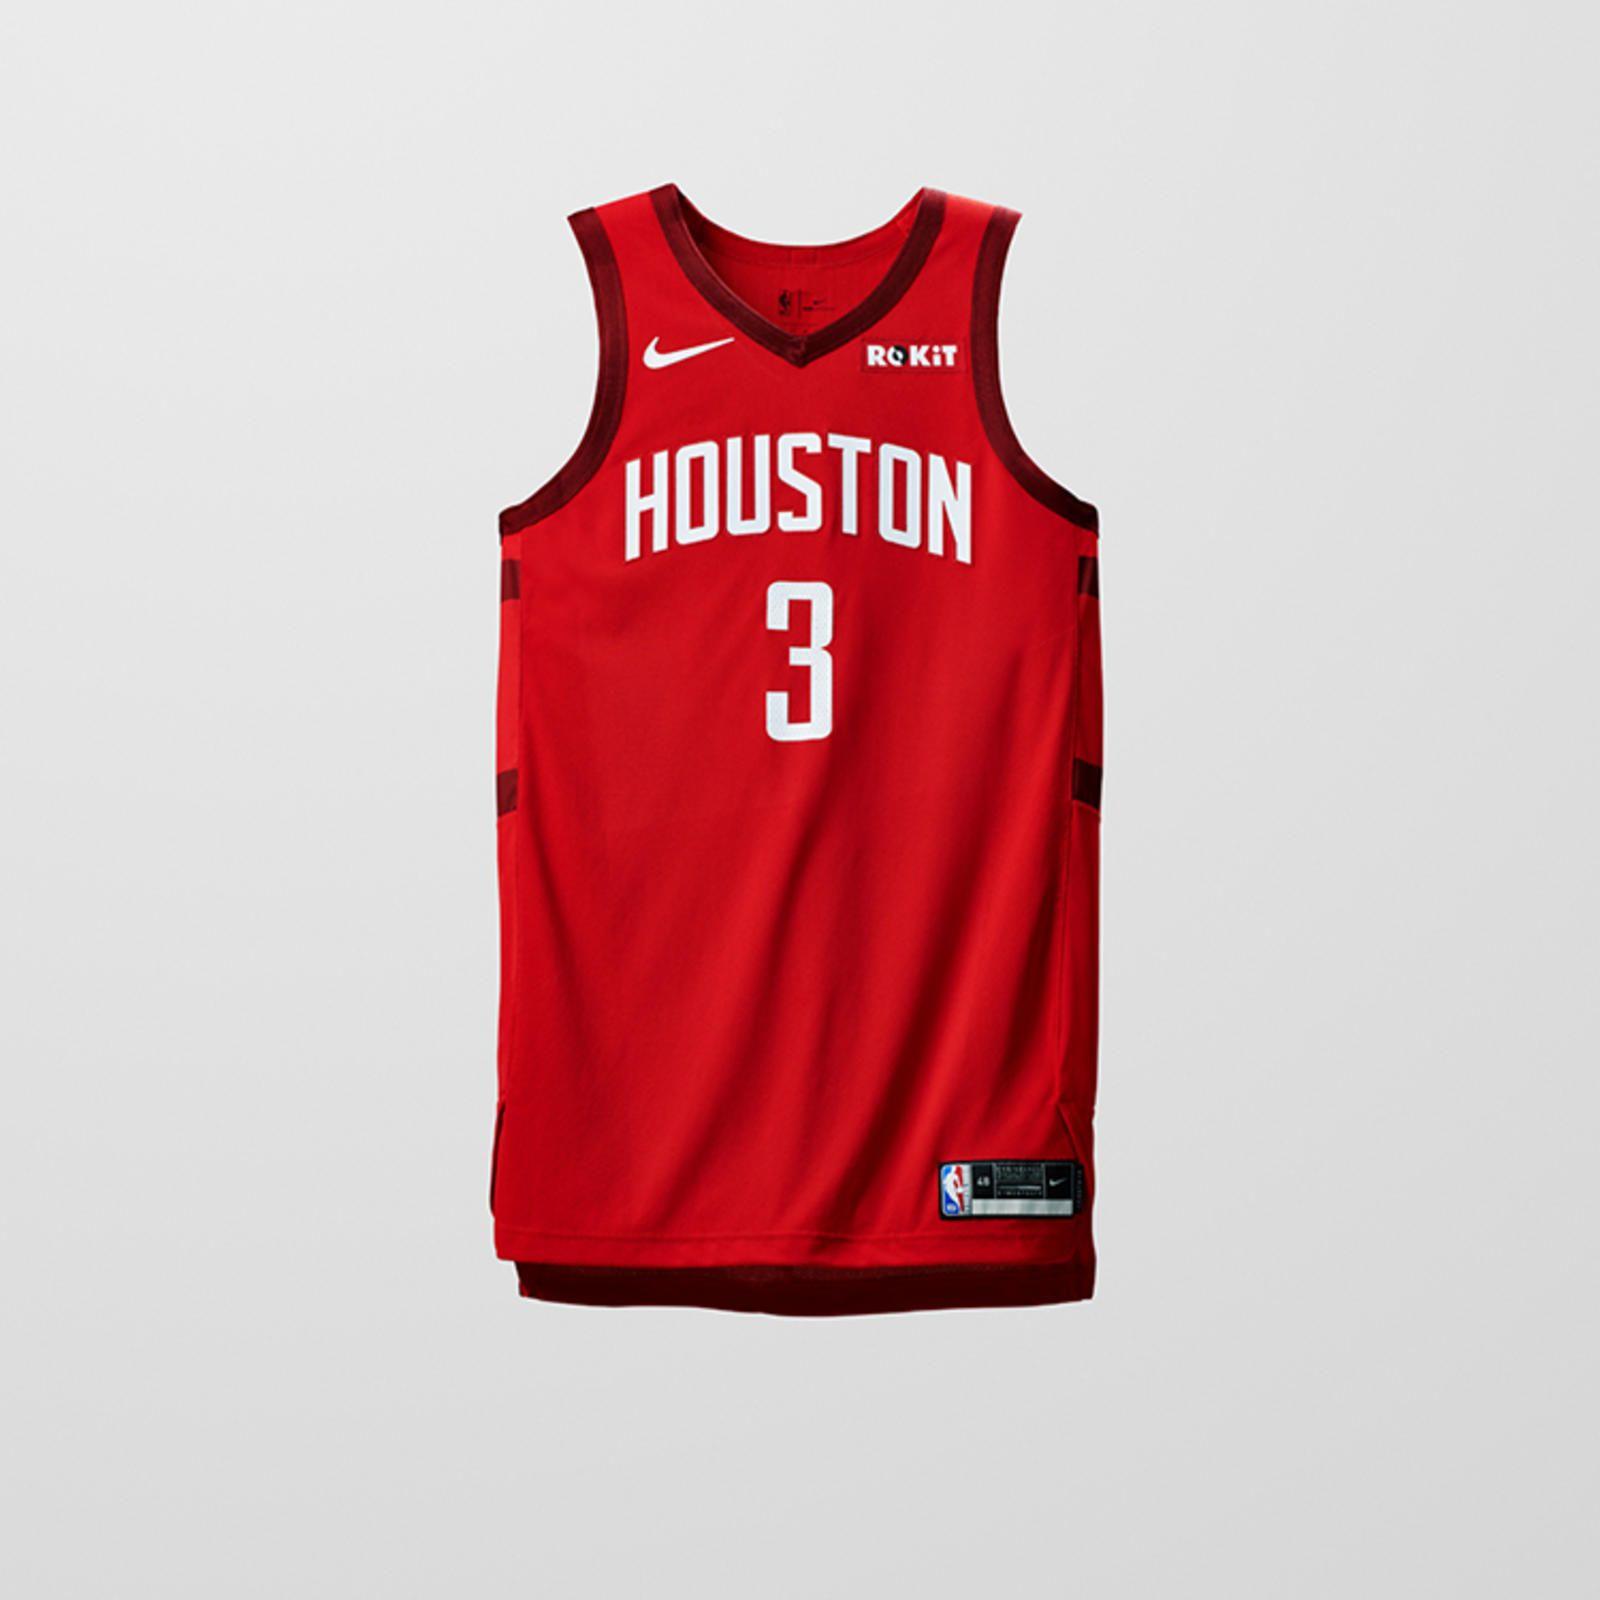 c5e28a9184f Introducing the Nike NBA Earned Edition Uniforms | athletics ...